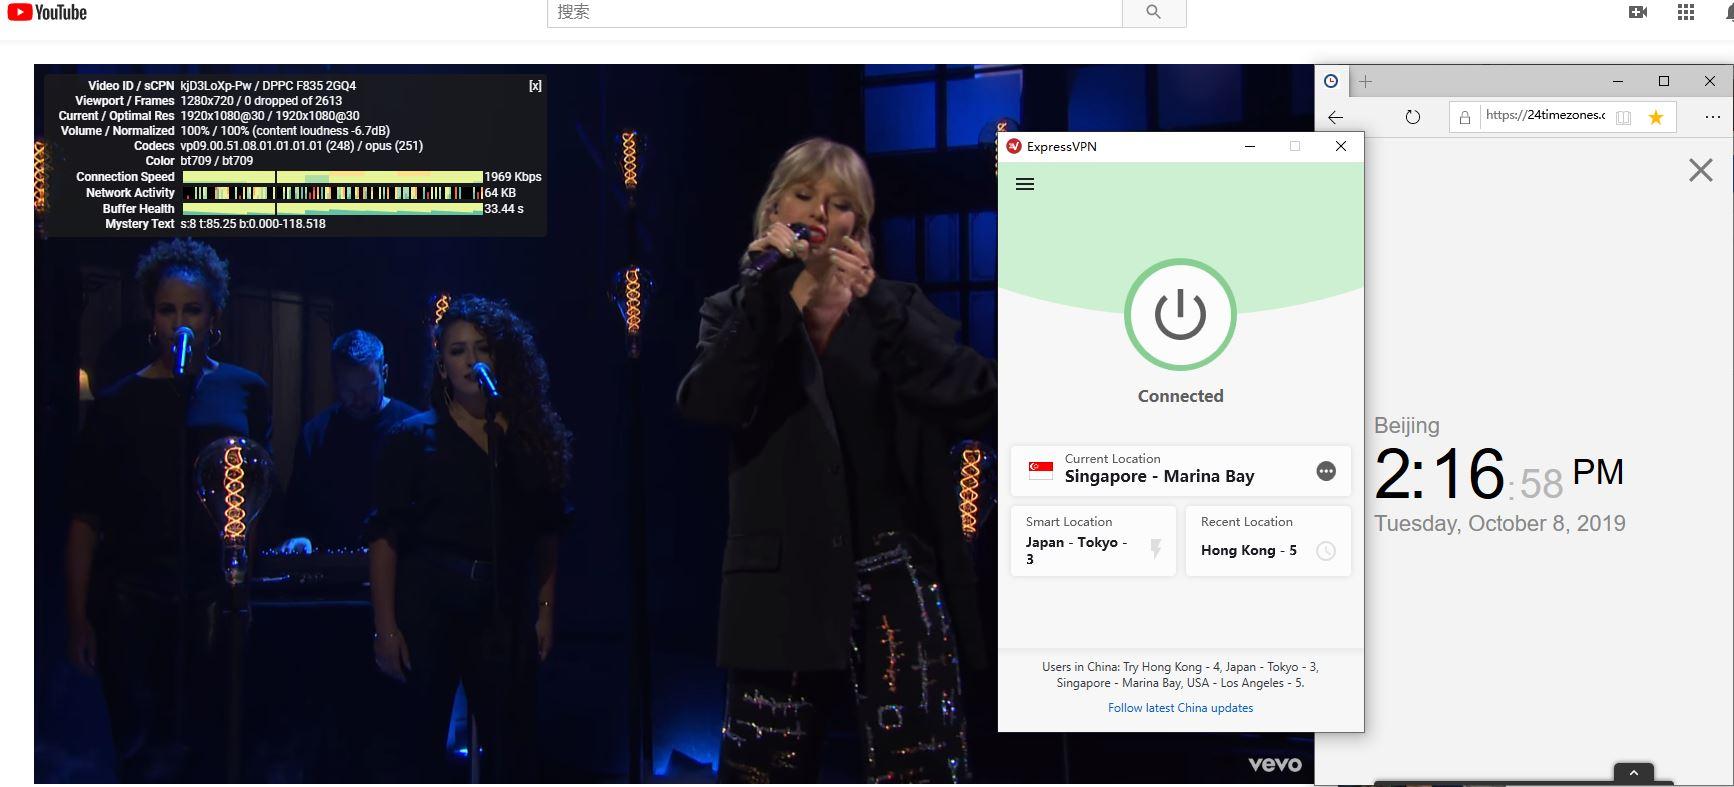 Windows ExpressVPN Singapore-Marina Bay 中国VPN翻墙 科学上网 YouTube测速-20191008